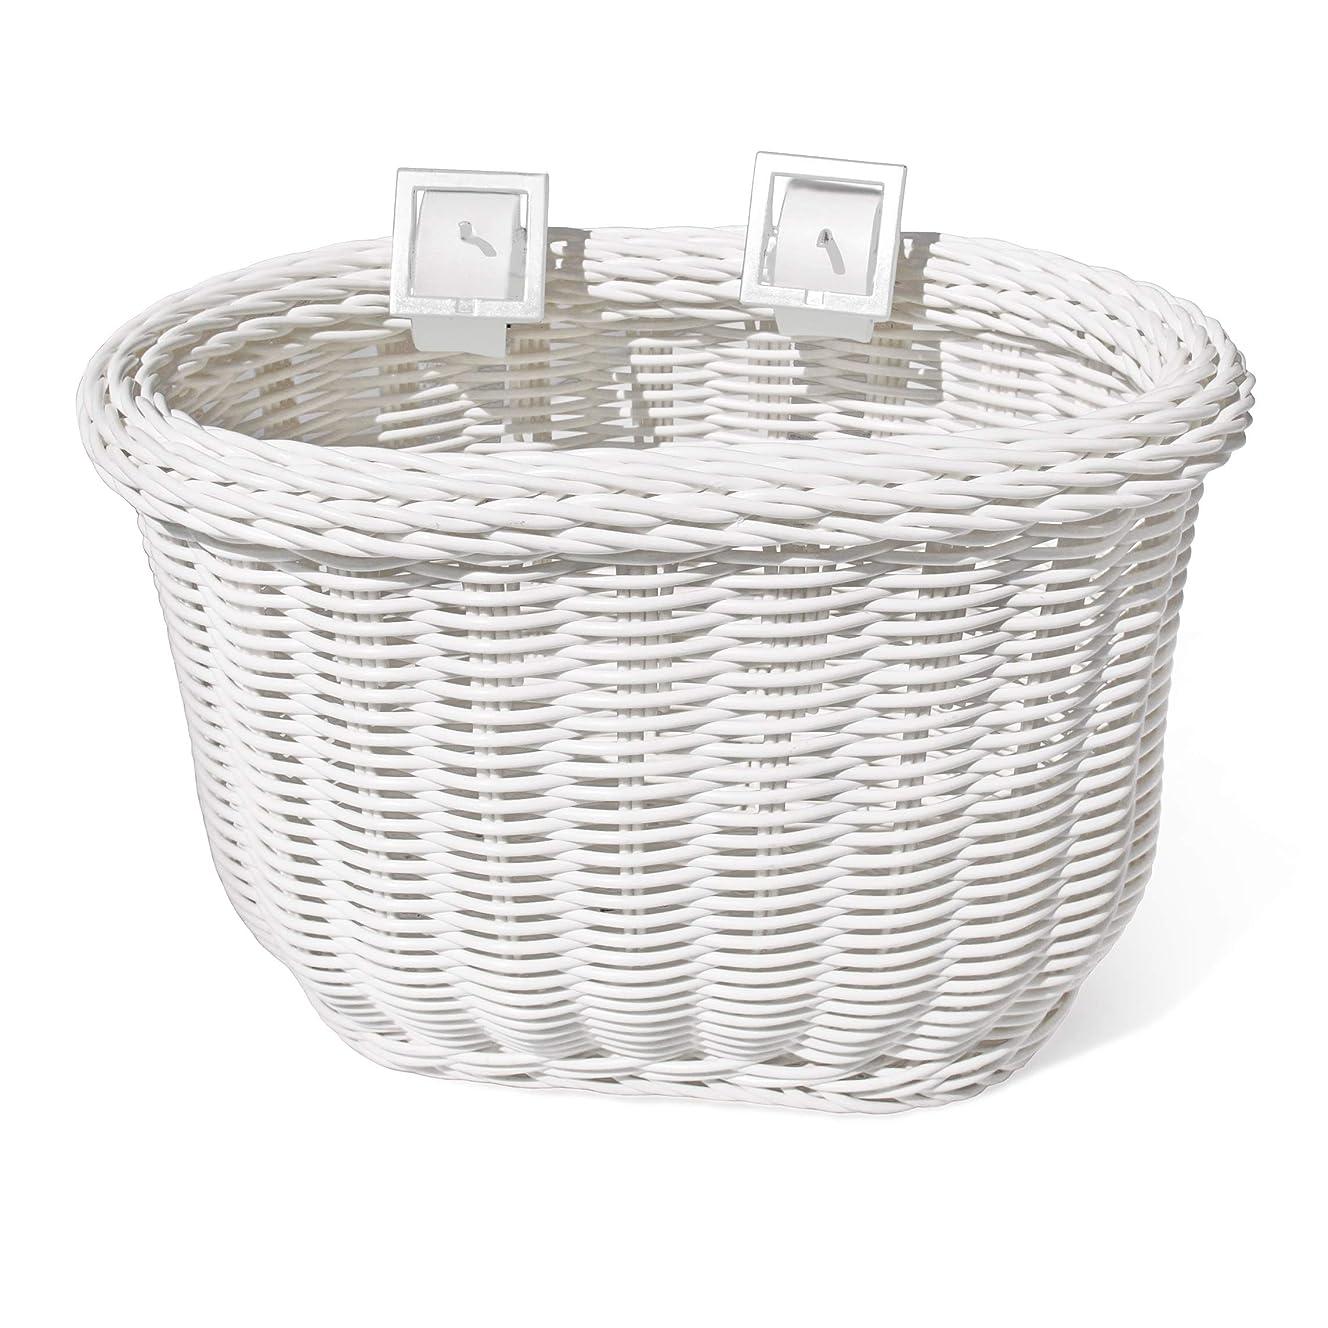 Colorbasket 01242 Kid's Front Handlebar Bike Basket, All Weather, Water Resistant, Adjustable Leather Straps, Food-Contact Safe, White